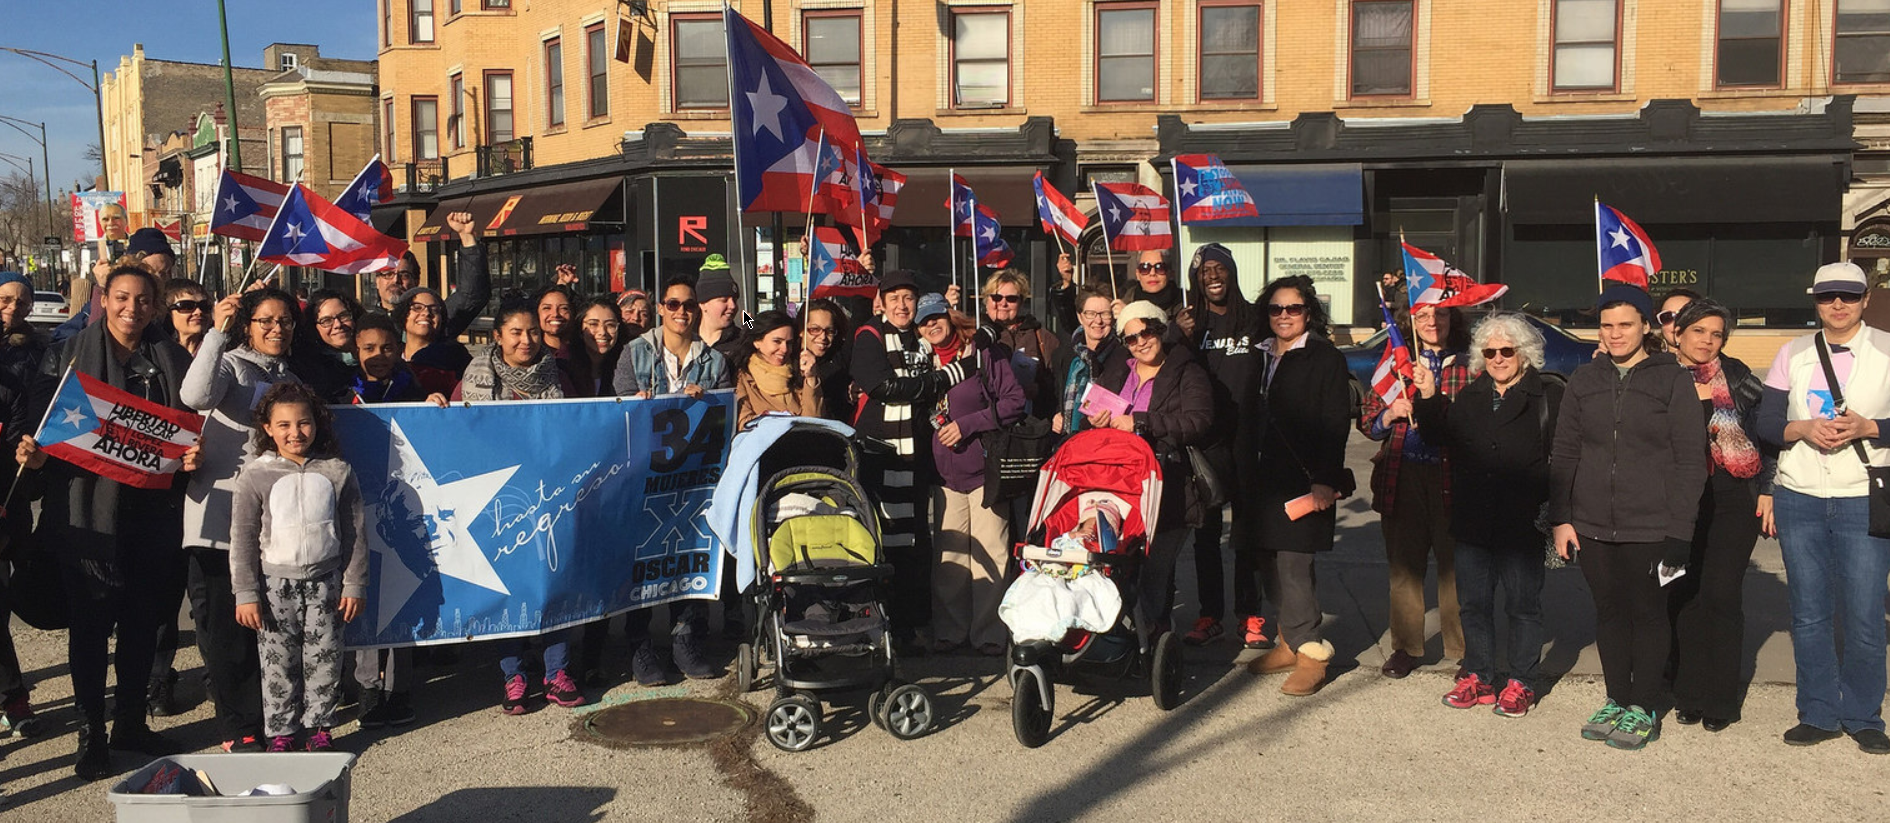 34 Women in Logan Square: April 30